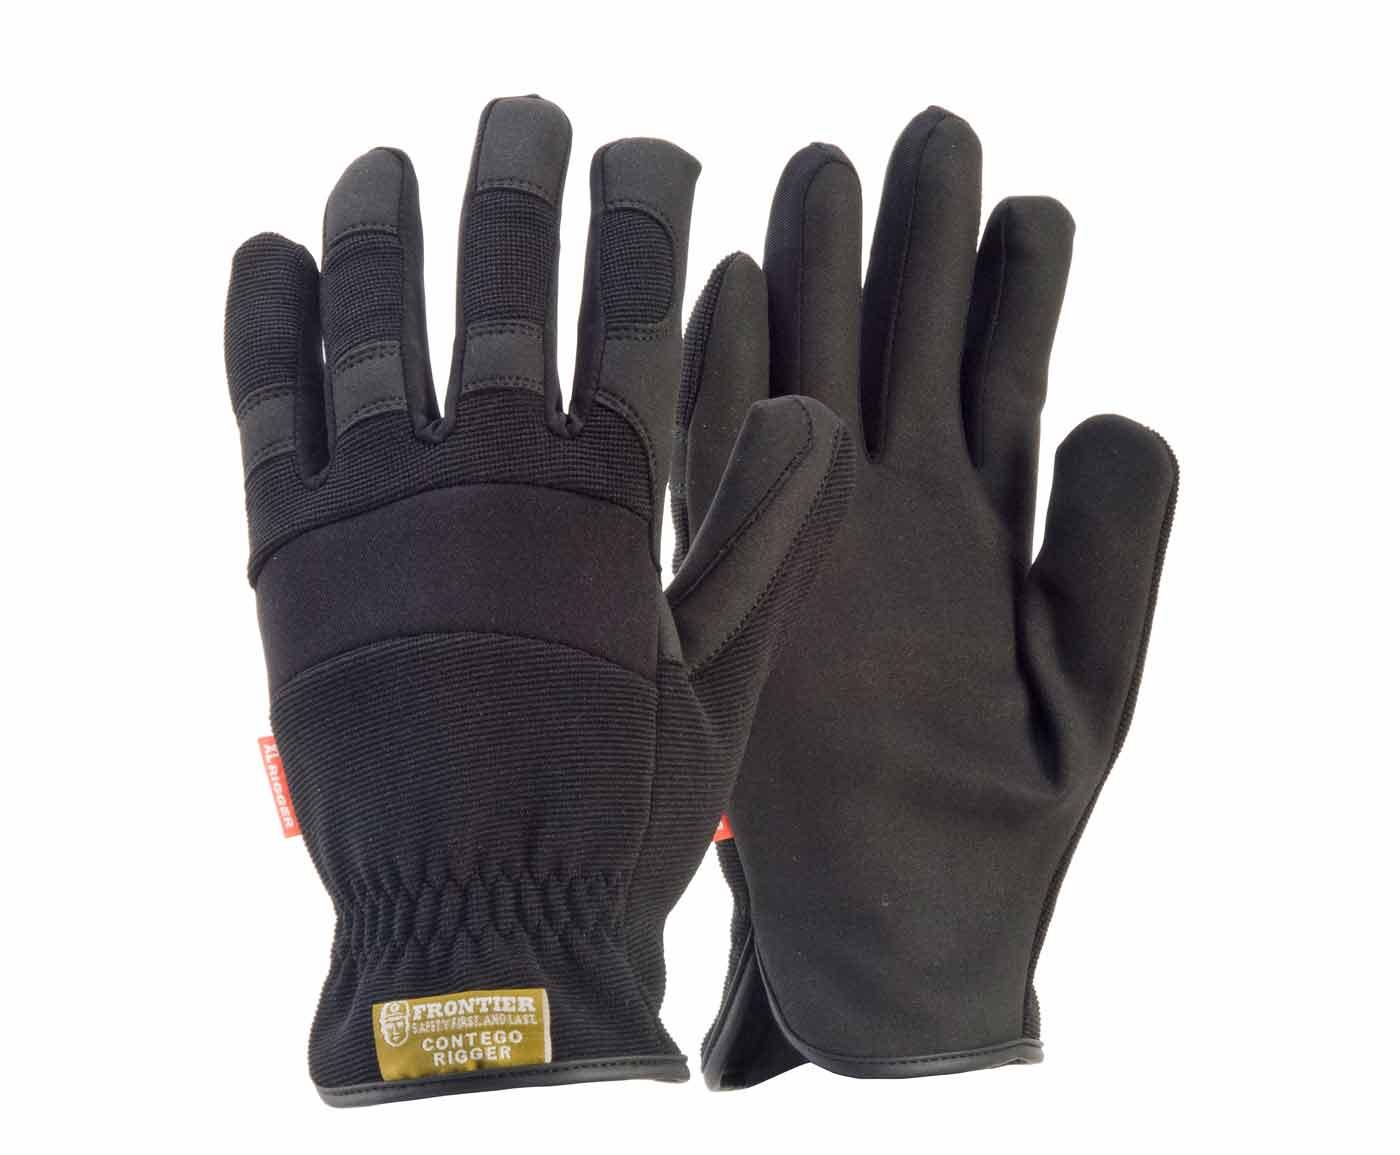 contego rigger safety gloves